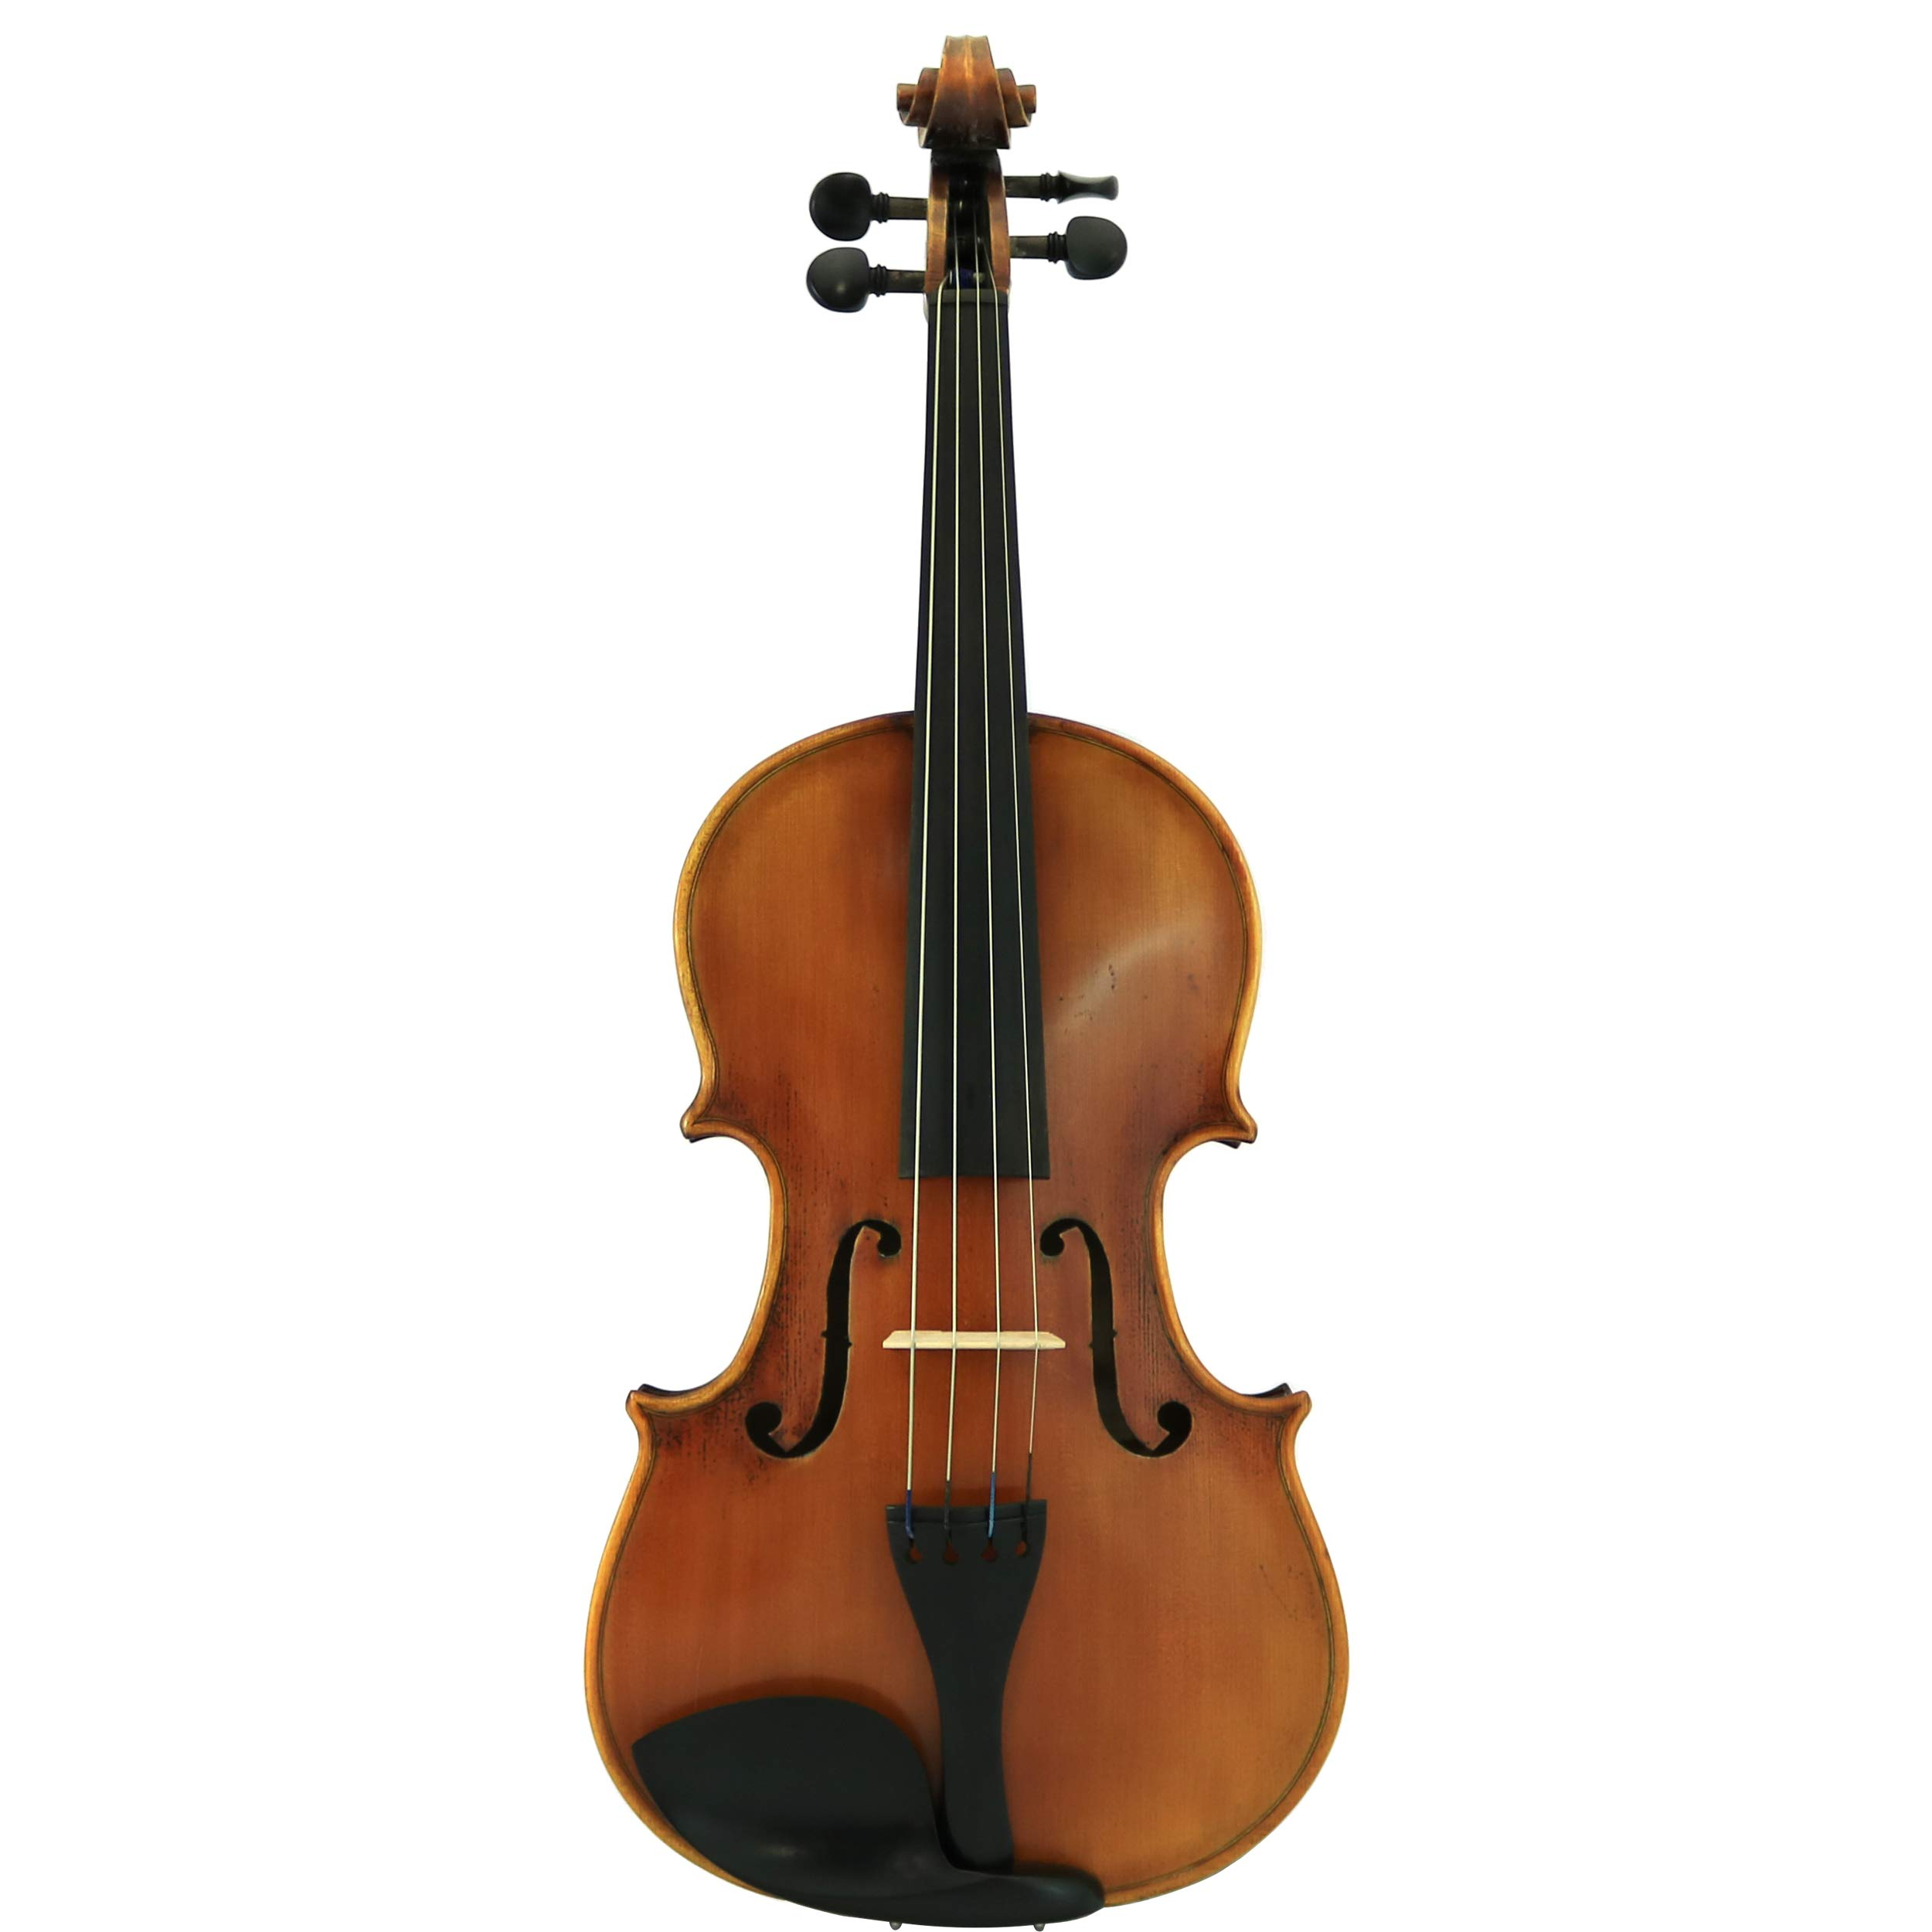 D'Luca CA500VAT-15.5 15.5-Inch Orchestral Series Antique Handmade Viola